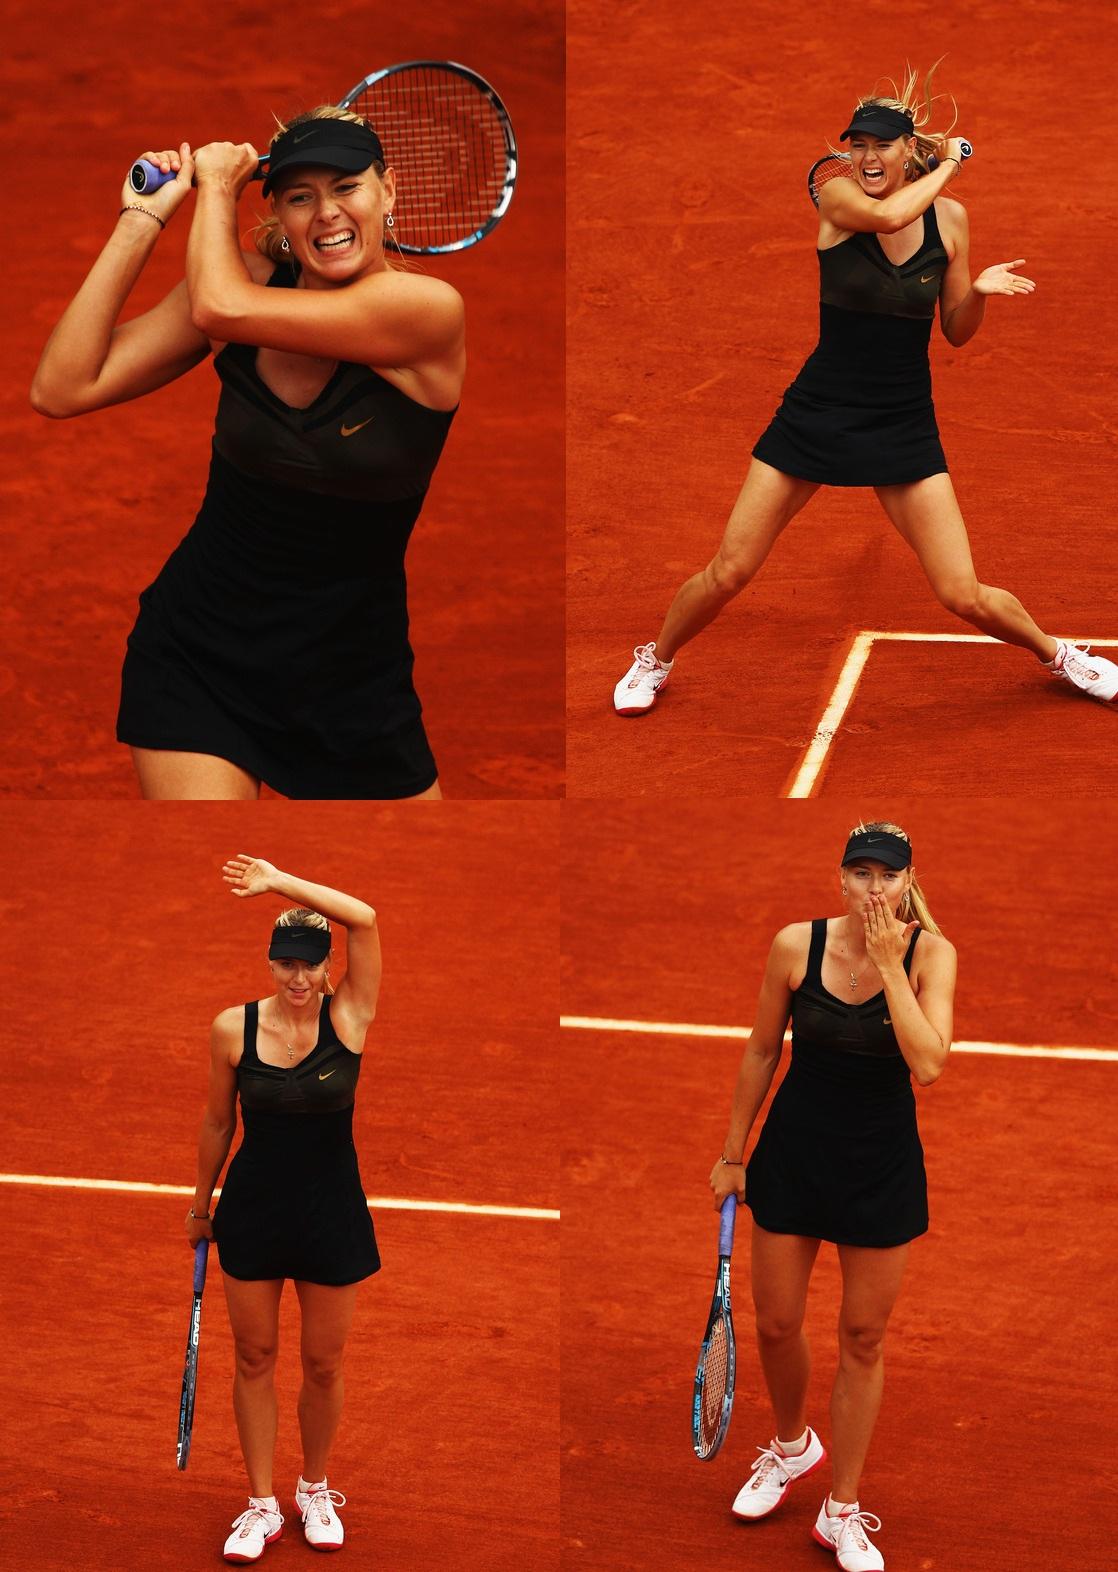 http://1.bp.blogspot.com/-VnpxYHRqHXM/T80oAfGOV8I/AAAAAAAADYc/u72QPioFZSA/s1600/Maria_Sharapova_SecondRound_French_Open.jpg